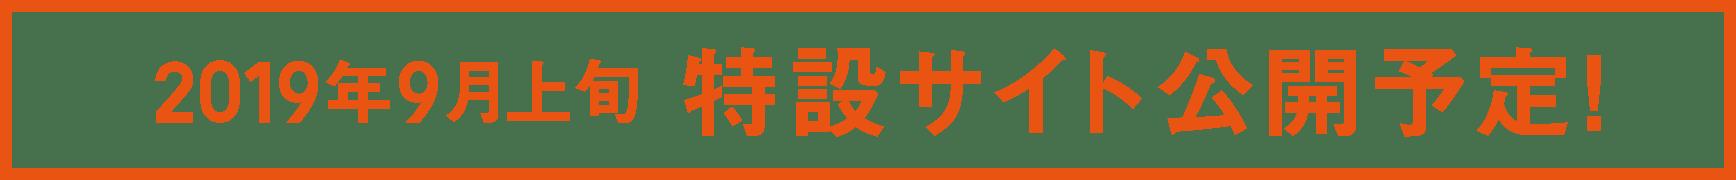 2019年9月上旬 特設サイト公開予定!